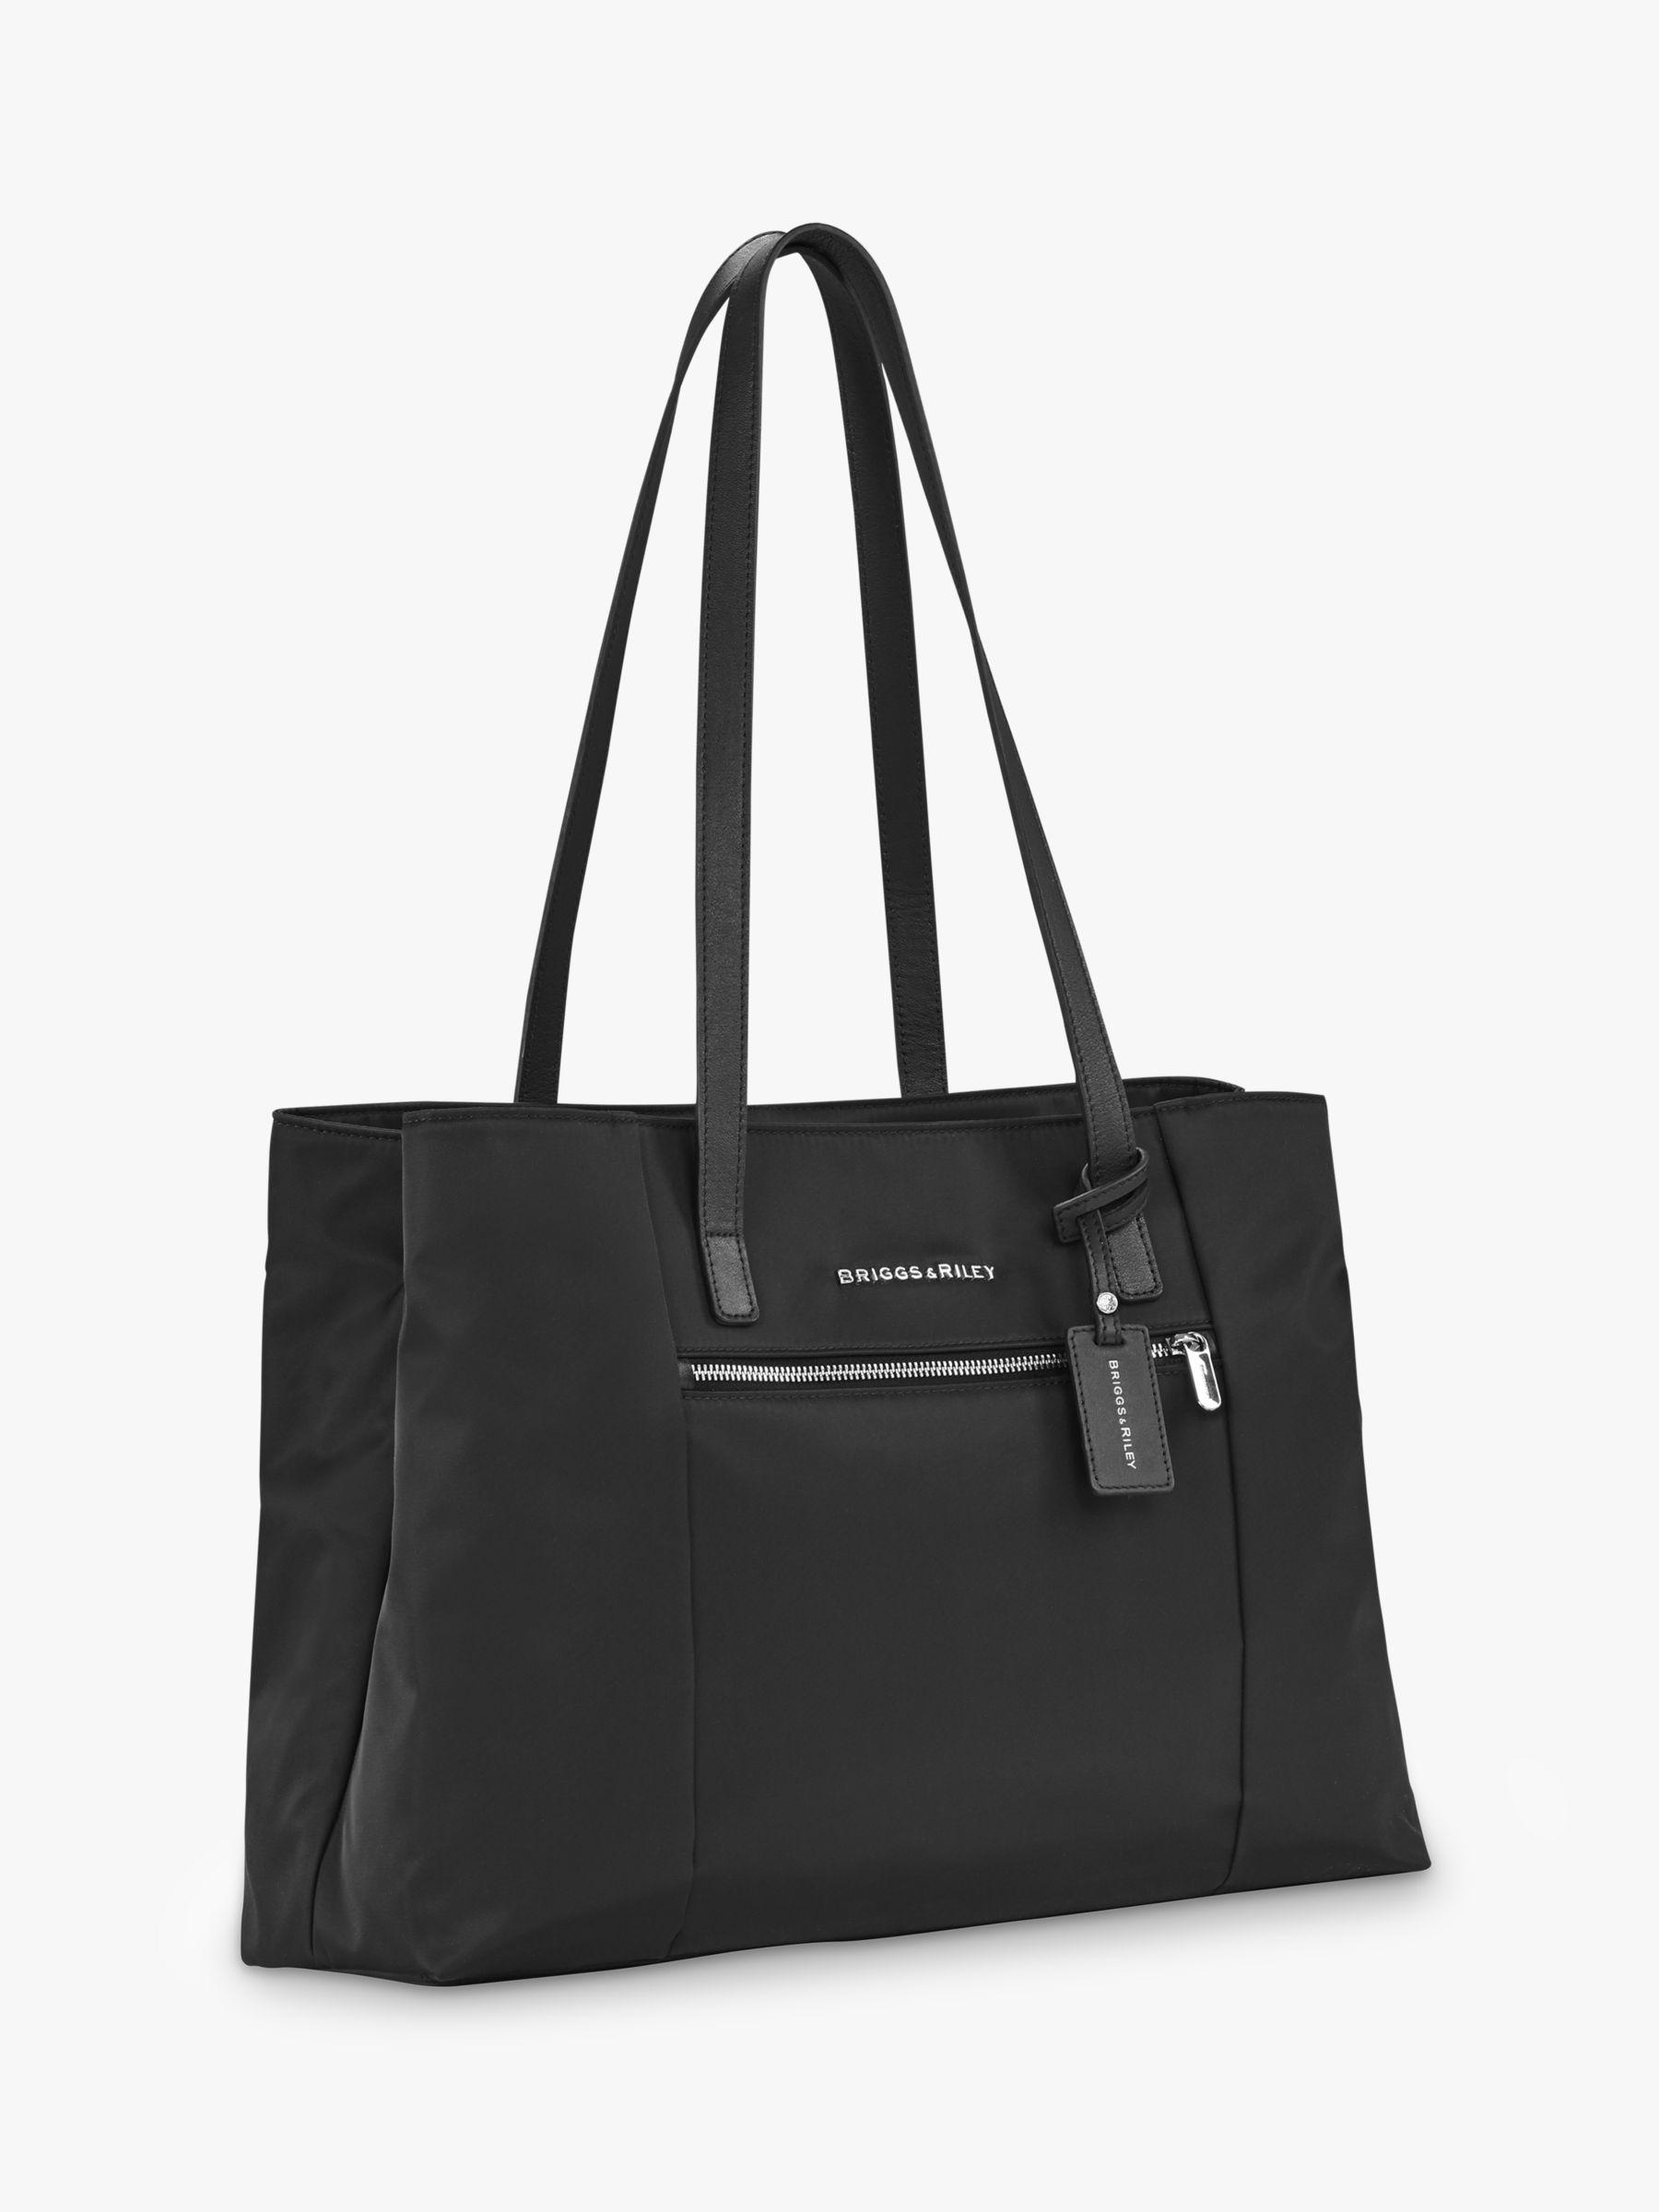 Briggs & Riley Briggs & Riley Rhapsody Essential Tote Travel Bag